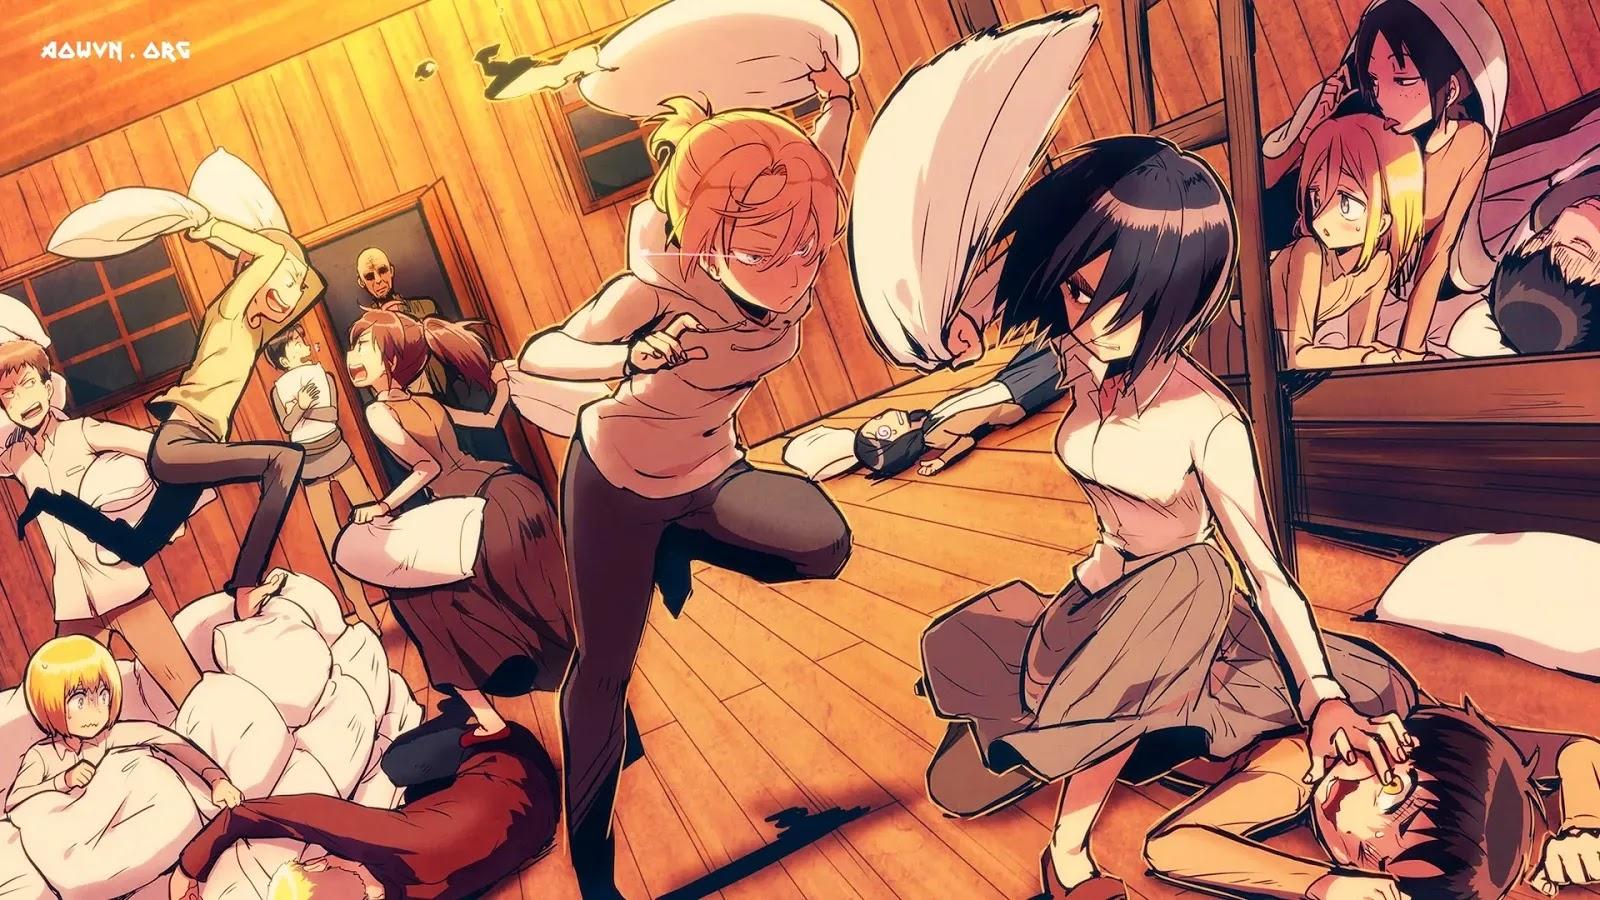 AowVN.org minz%2B%25283%2529 - [ Anime 3gp Mp4 ] Attack On Titan TV & Bluray SS1 + SS2 | Vietsub - Shingeki No Kyojin